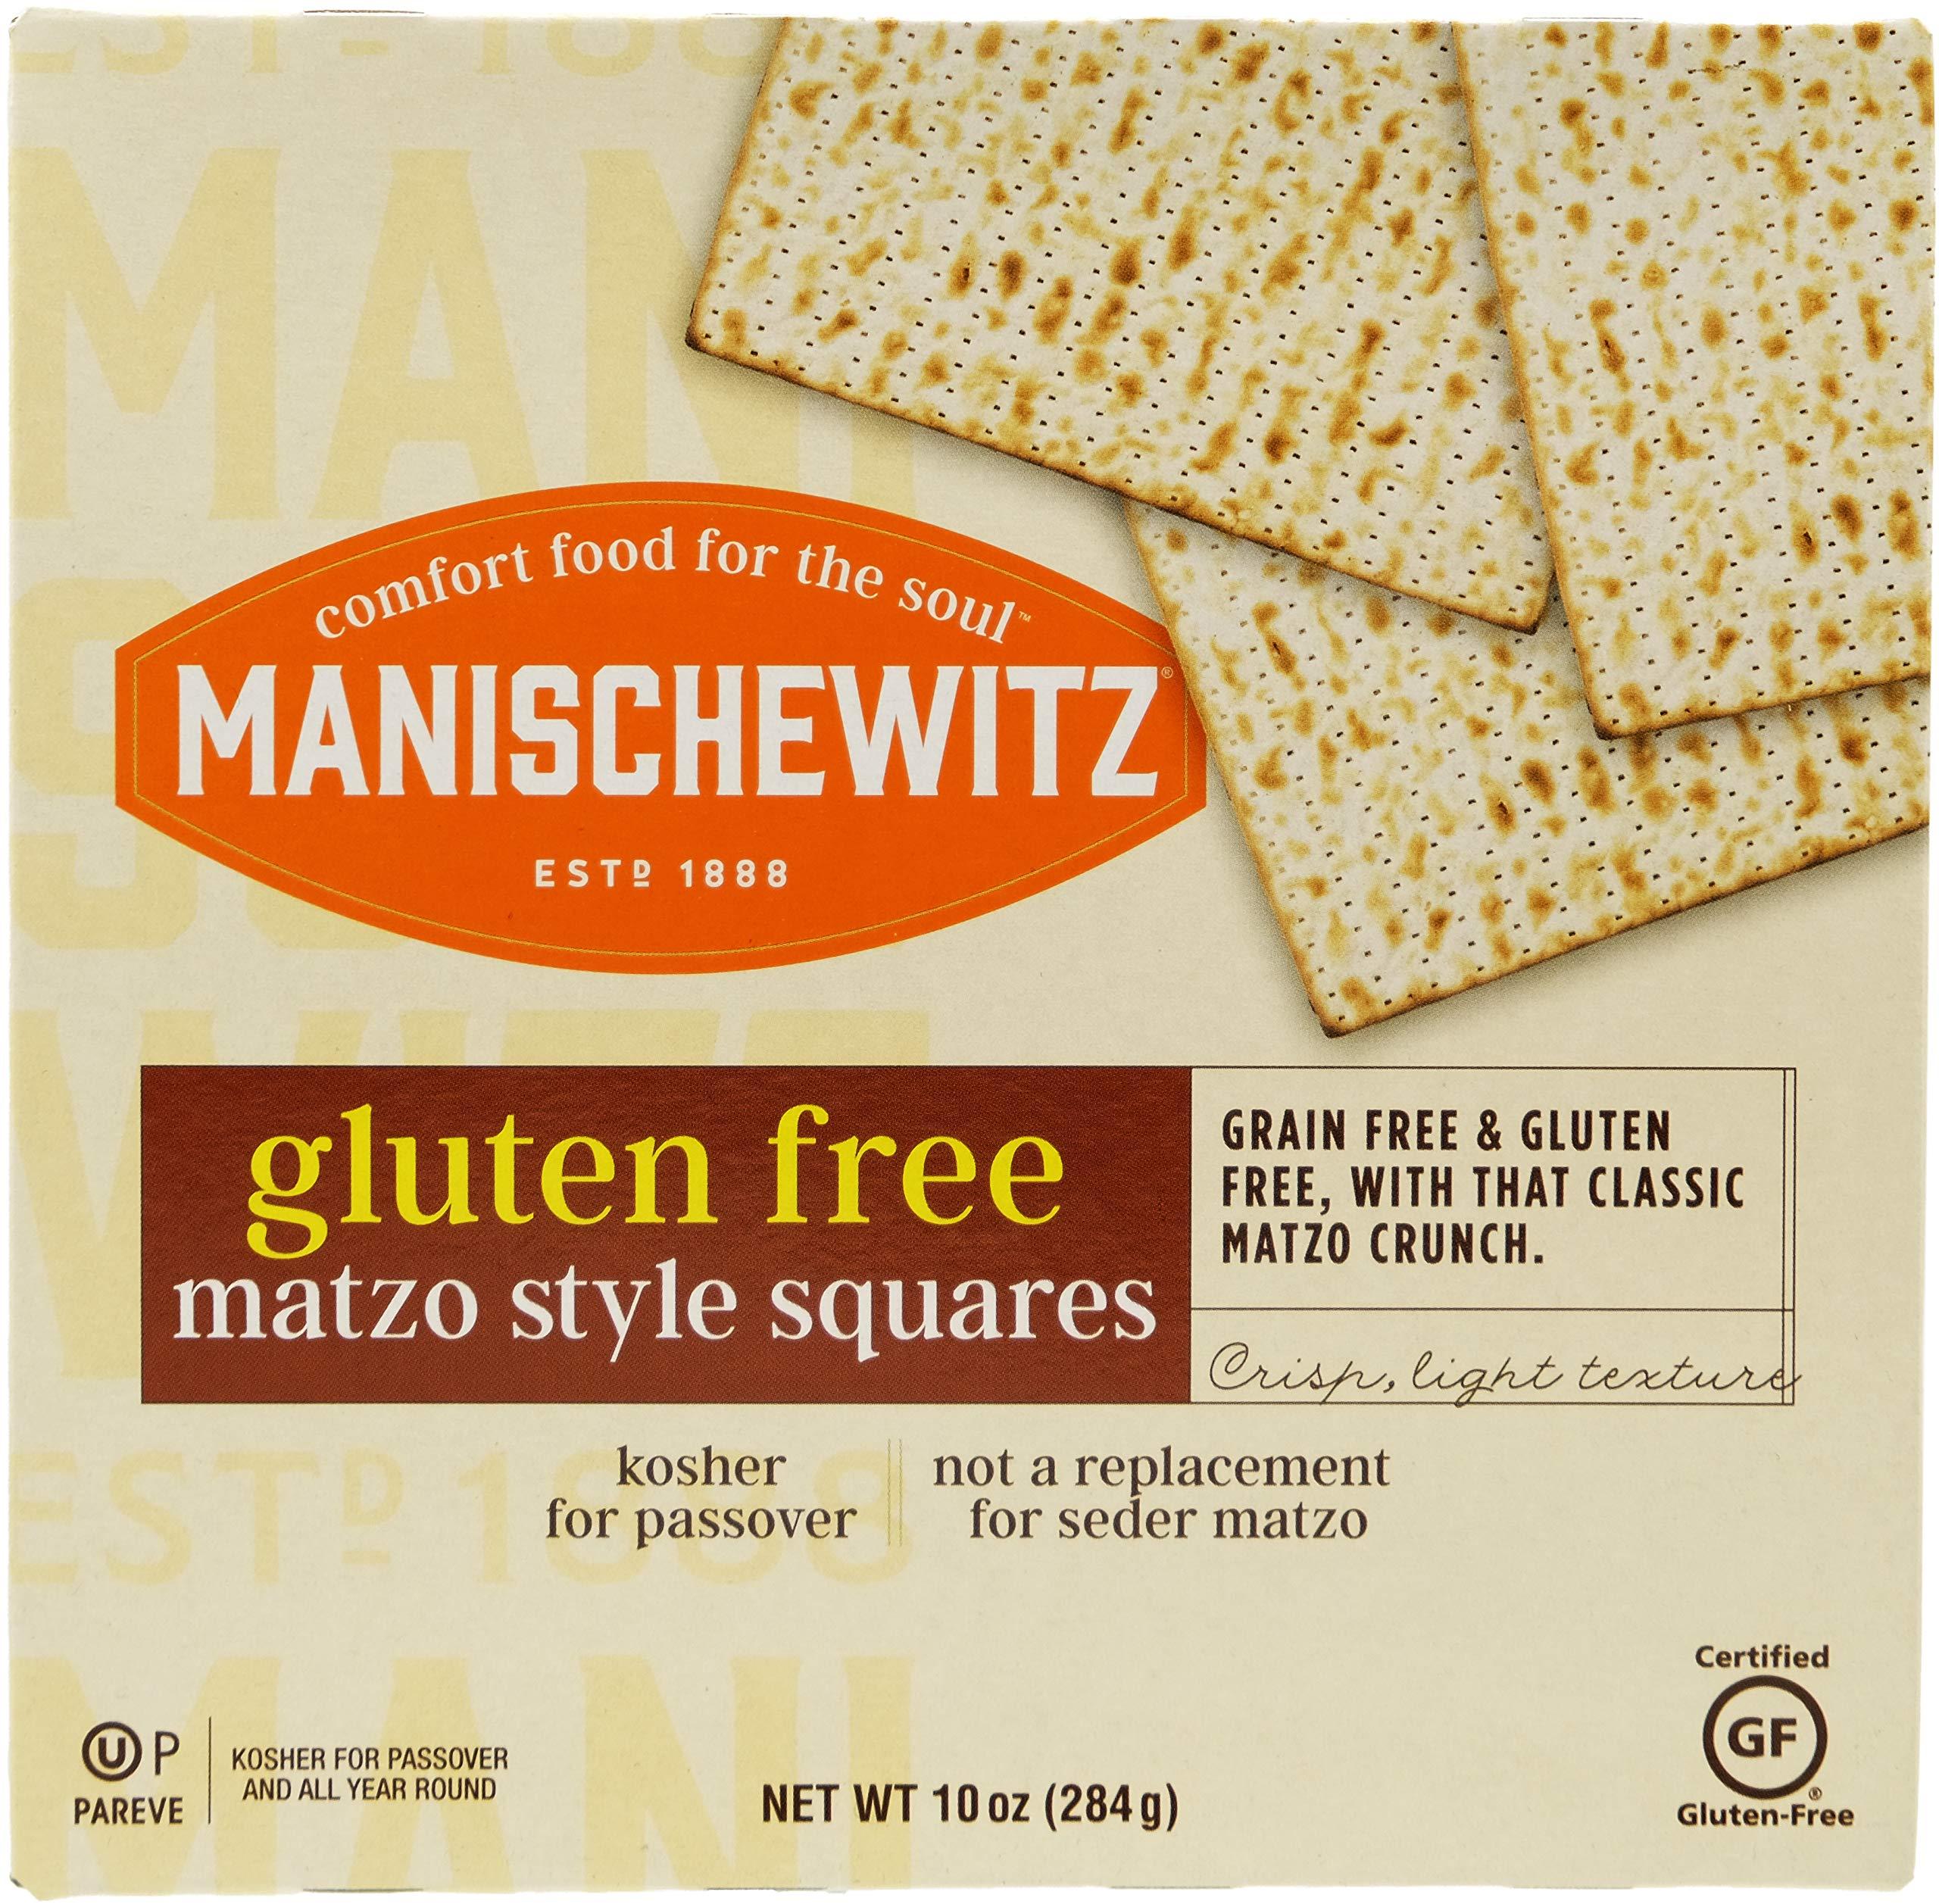 Manischewitz All Natural Gluten-Free Matzo Style Squares, 10 Ounce